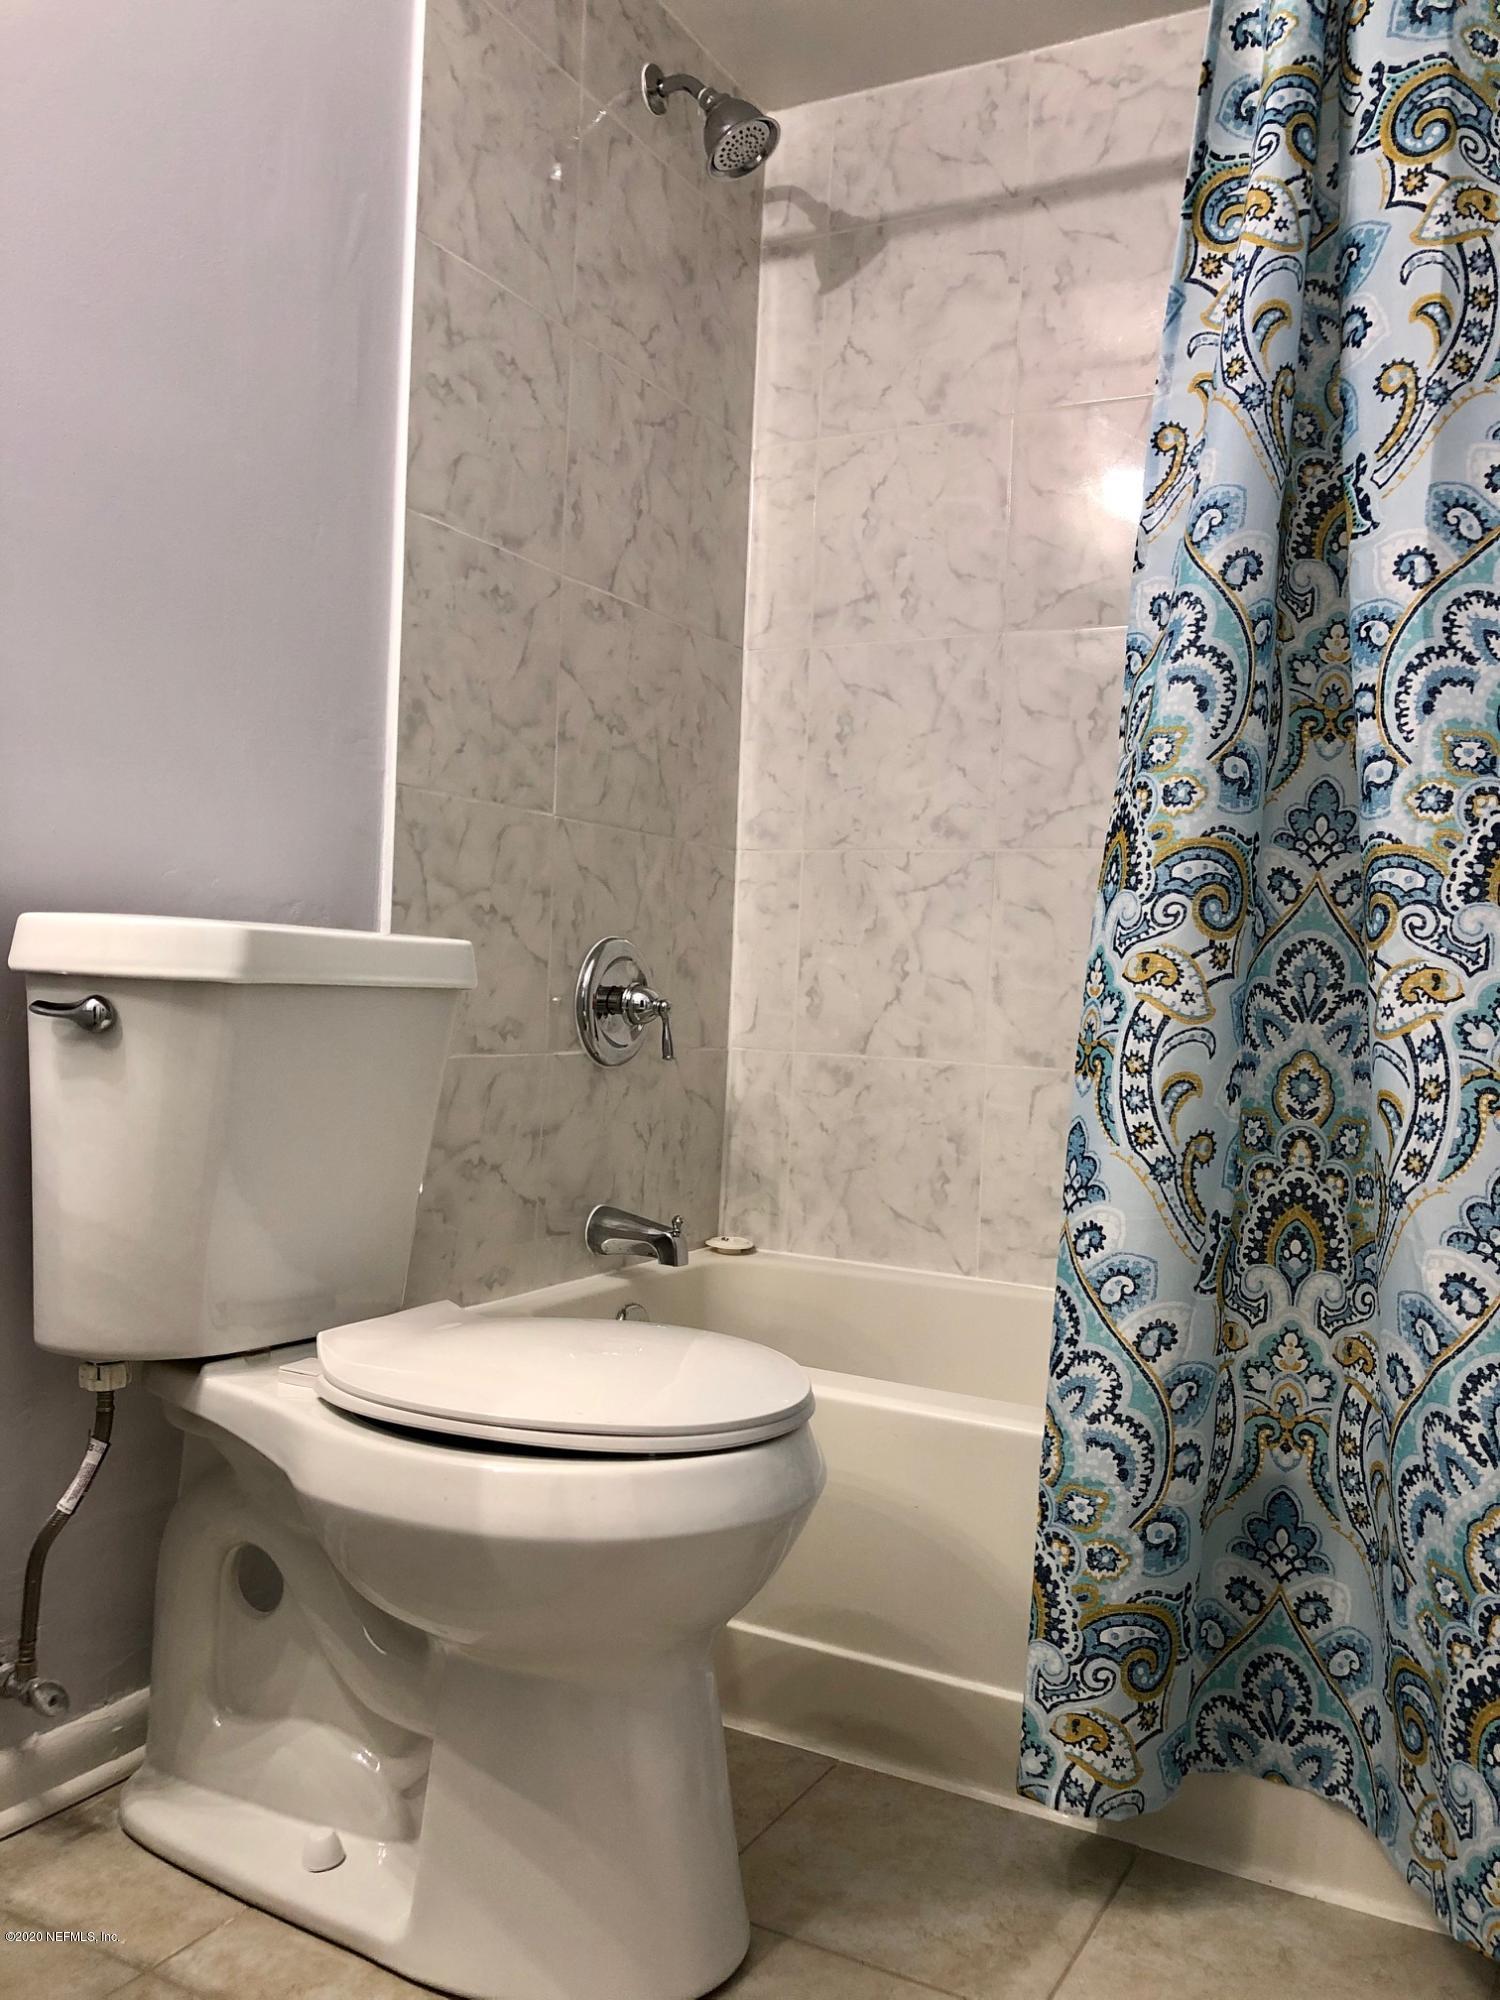 8347 WINDYPINE, JACKSONVILLE, FLORIDA 32244, 2 Bedrooms Bedrooms, ,2 BathroomsBathrooms,Rental,For Rent,WINDYPINE,1081830